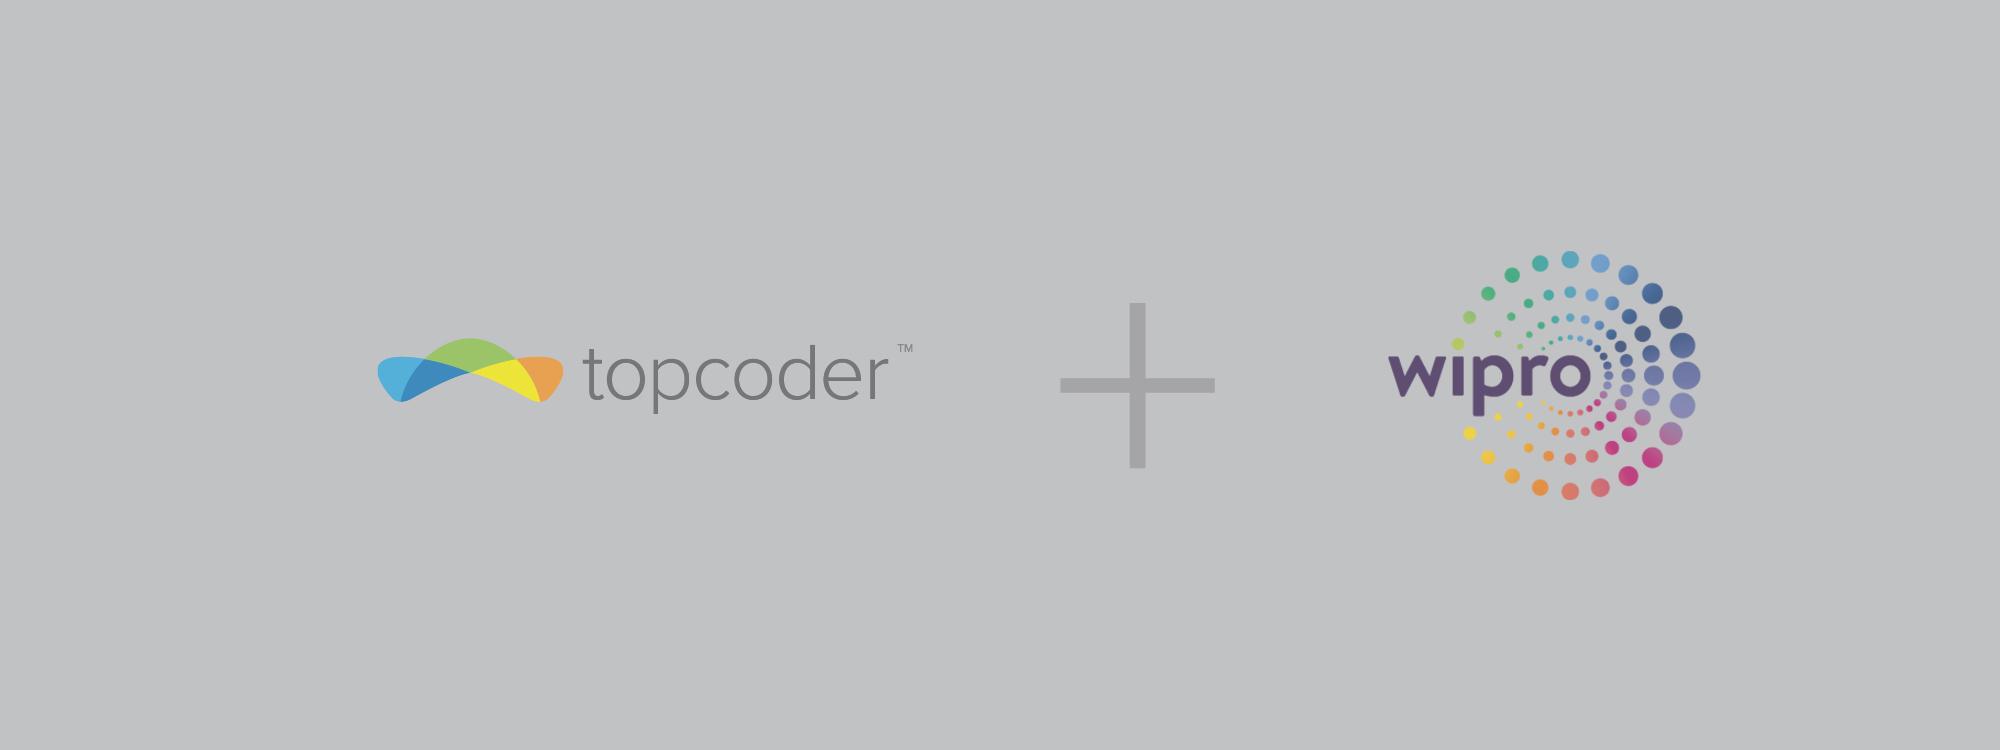 News Item: Wipro Acquires Appirio - Topcoder